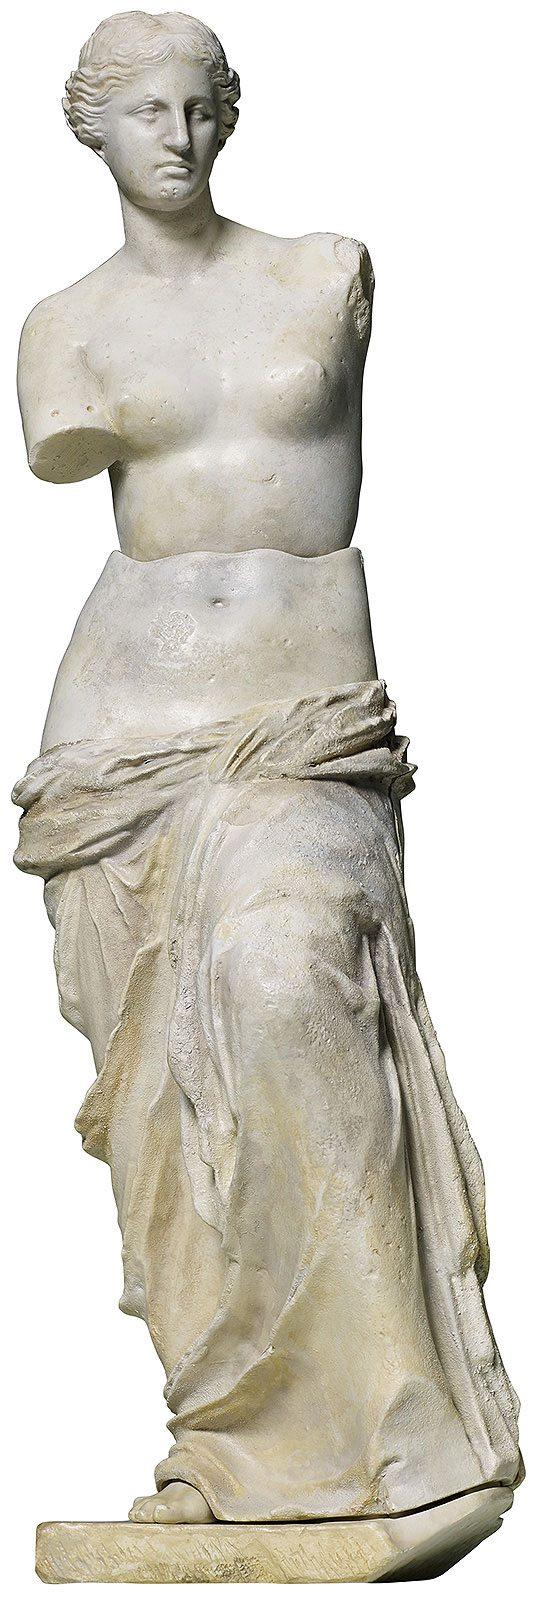 The Table Museum Figma Action Figure Venus de Milo 15 cm